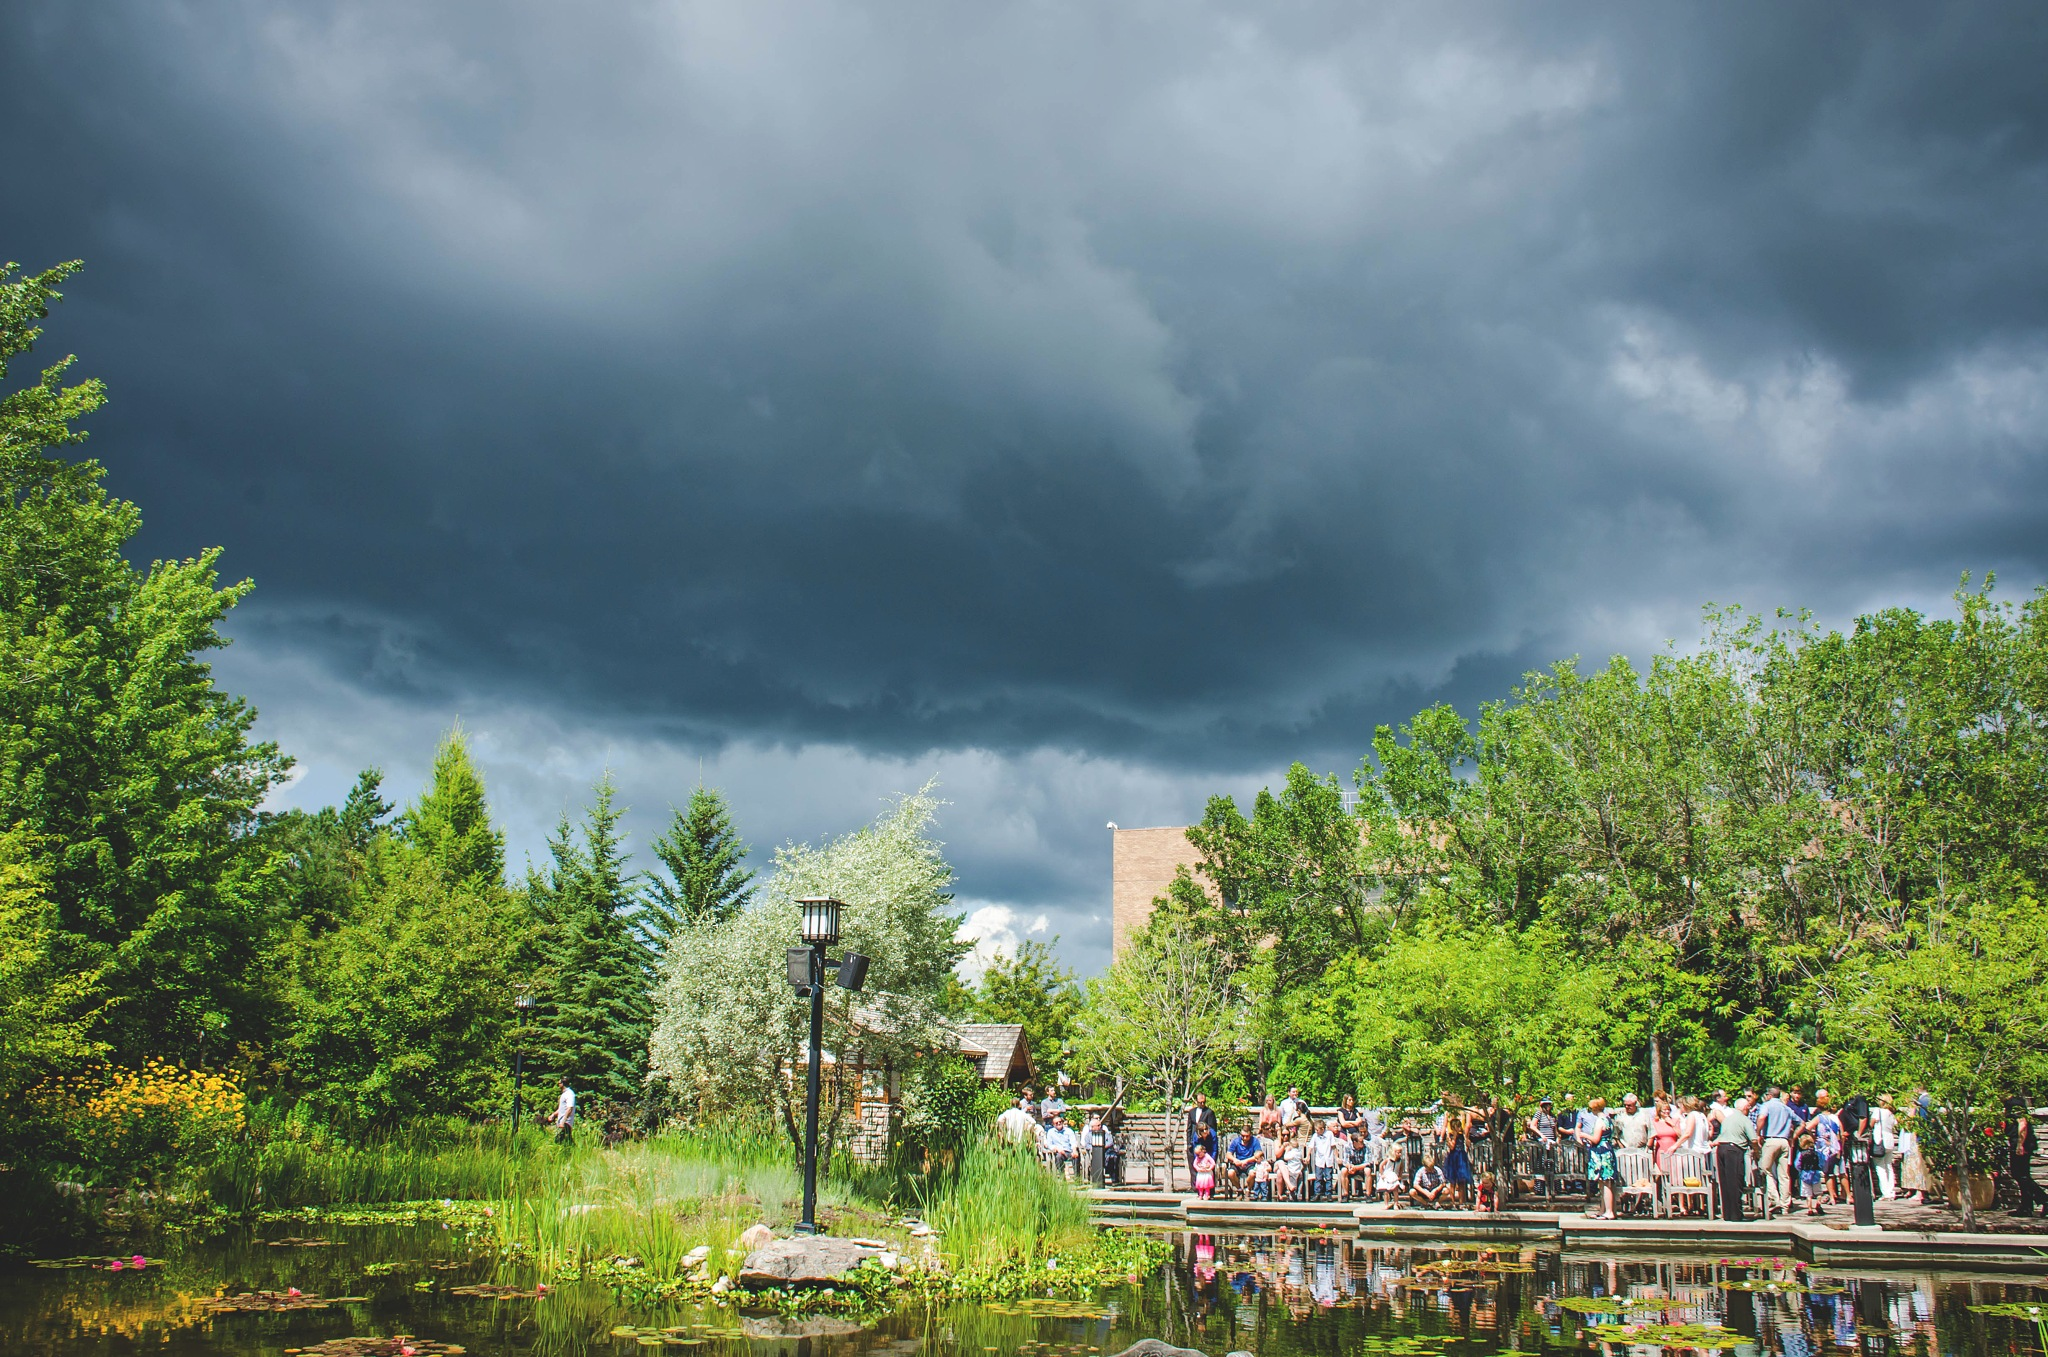 Wedding Weather Delay by Ang Klassen